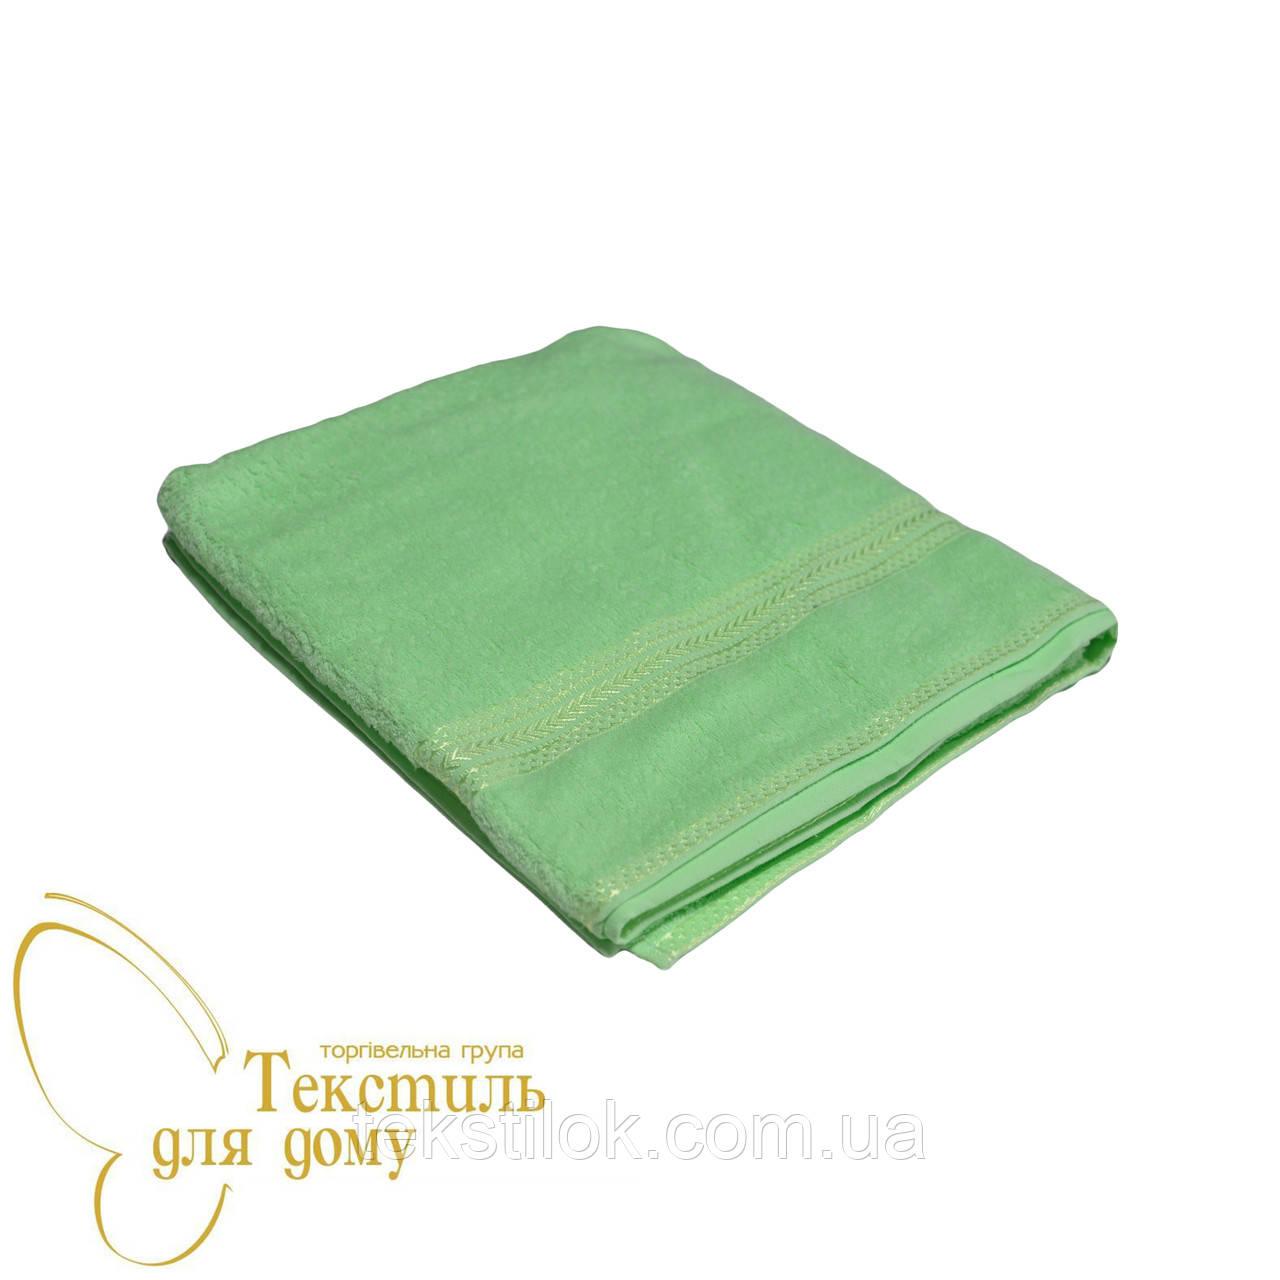 Полотенце для сауны 100*150, 360 гр/м2, салатовое